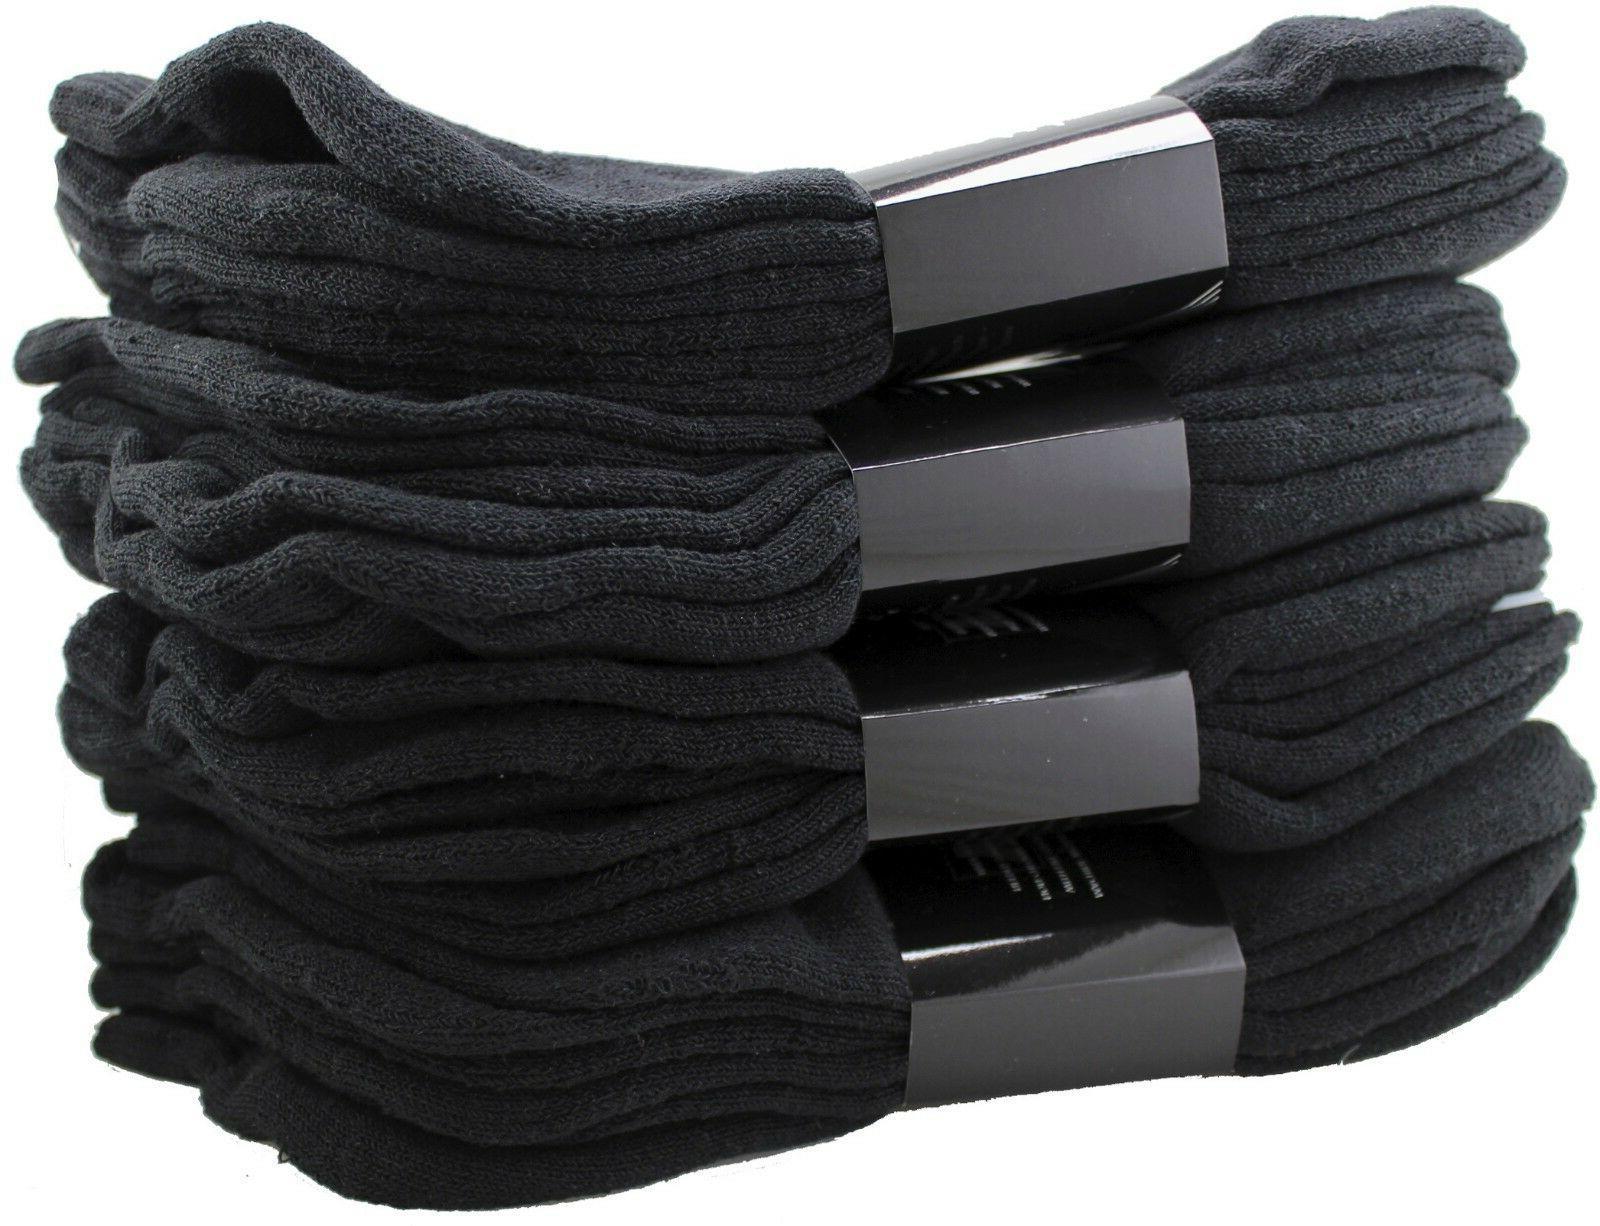 new 3 12 pairs men black ankle